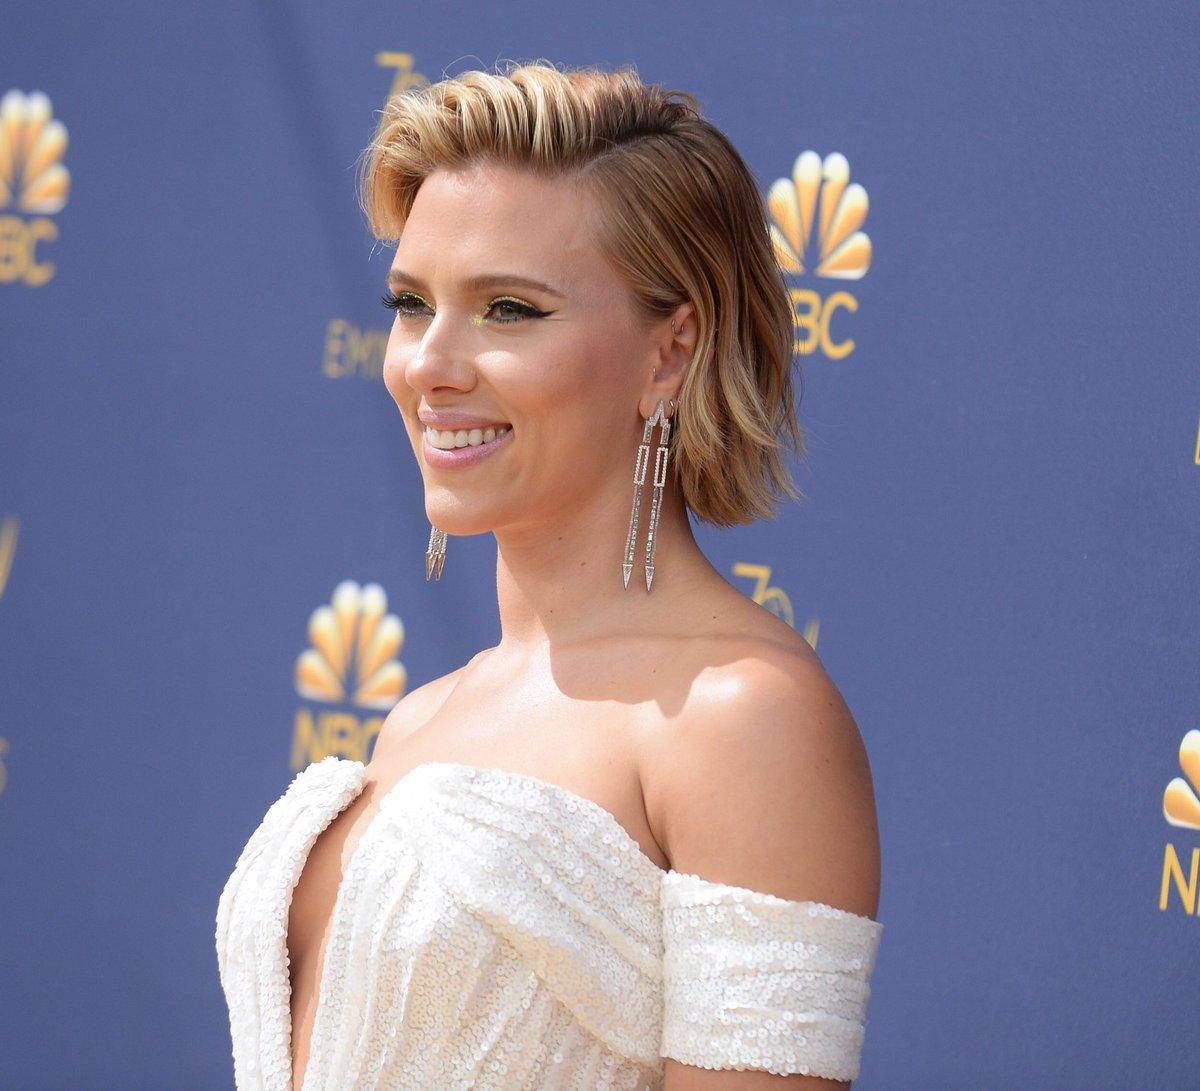 Twitter Scarlett Johansson nudes (26 photo), Pussy, Fappening, Twitter, braless 2018